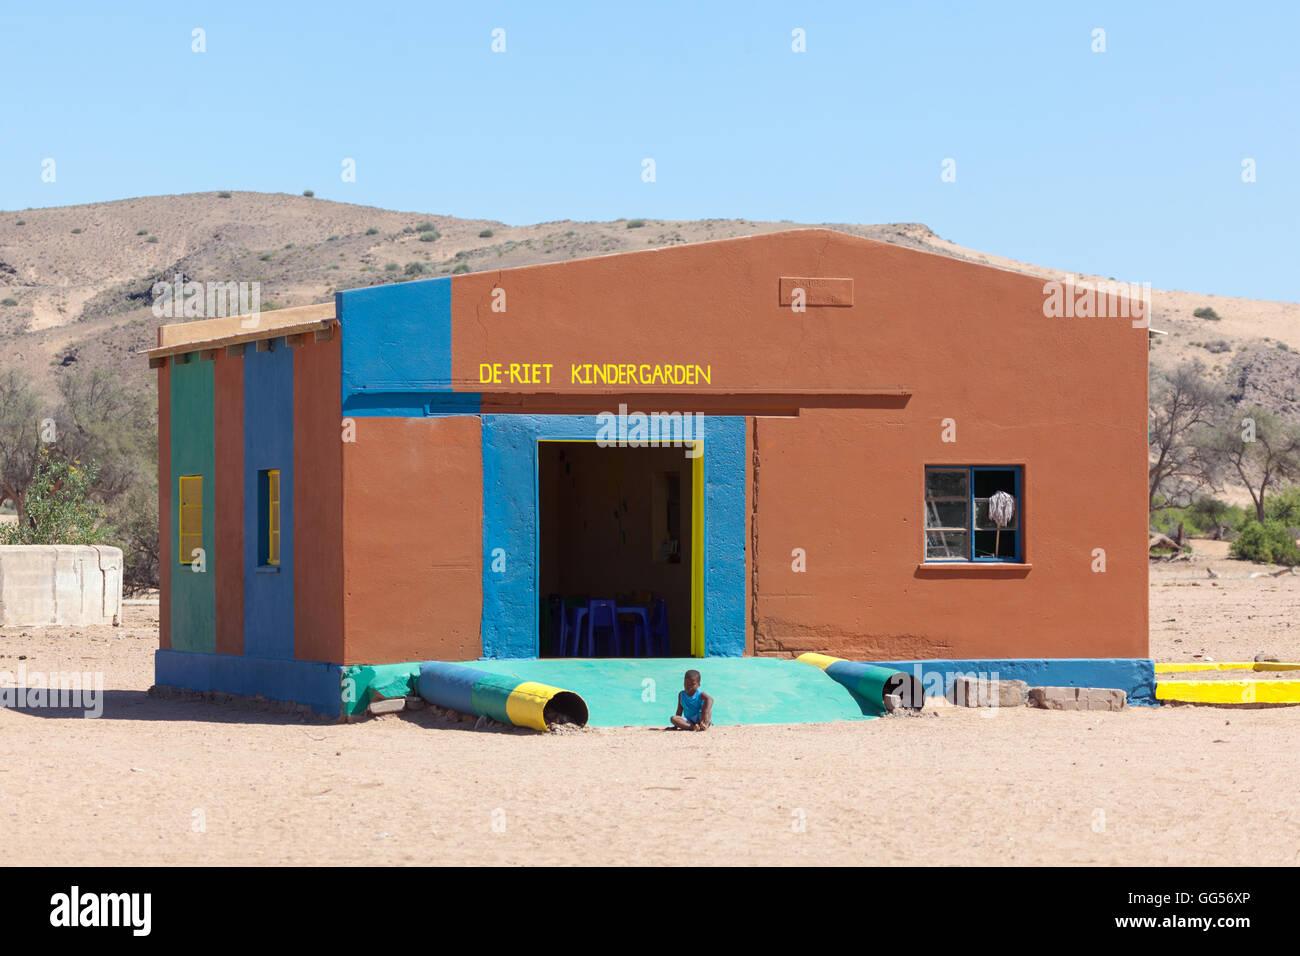 Damaraland Namibia De-Riet Kindergarden school, near Doro Nawas - Stock Image